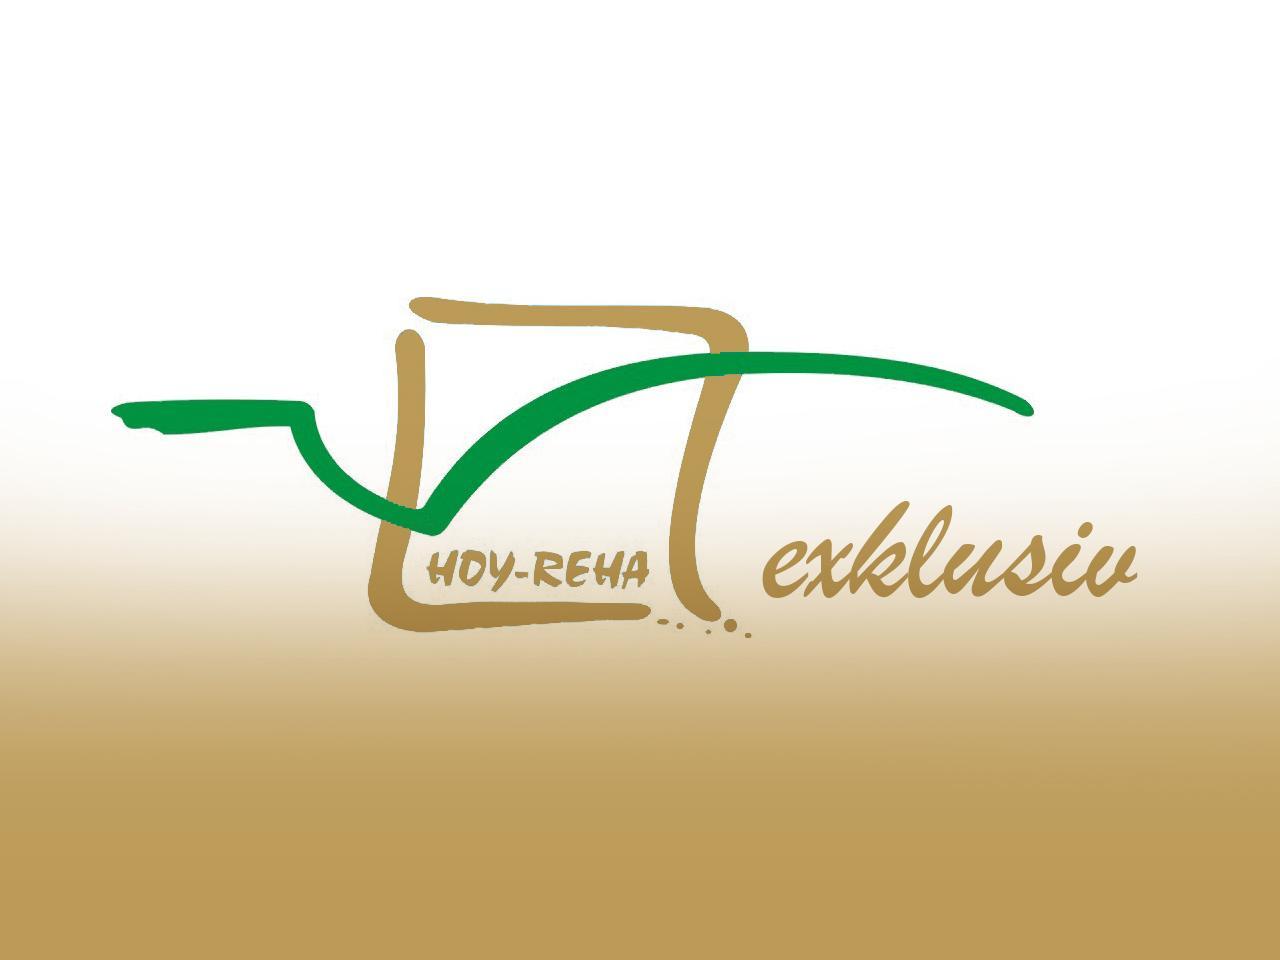 HOY-REHA Exklusiv Logo